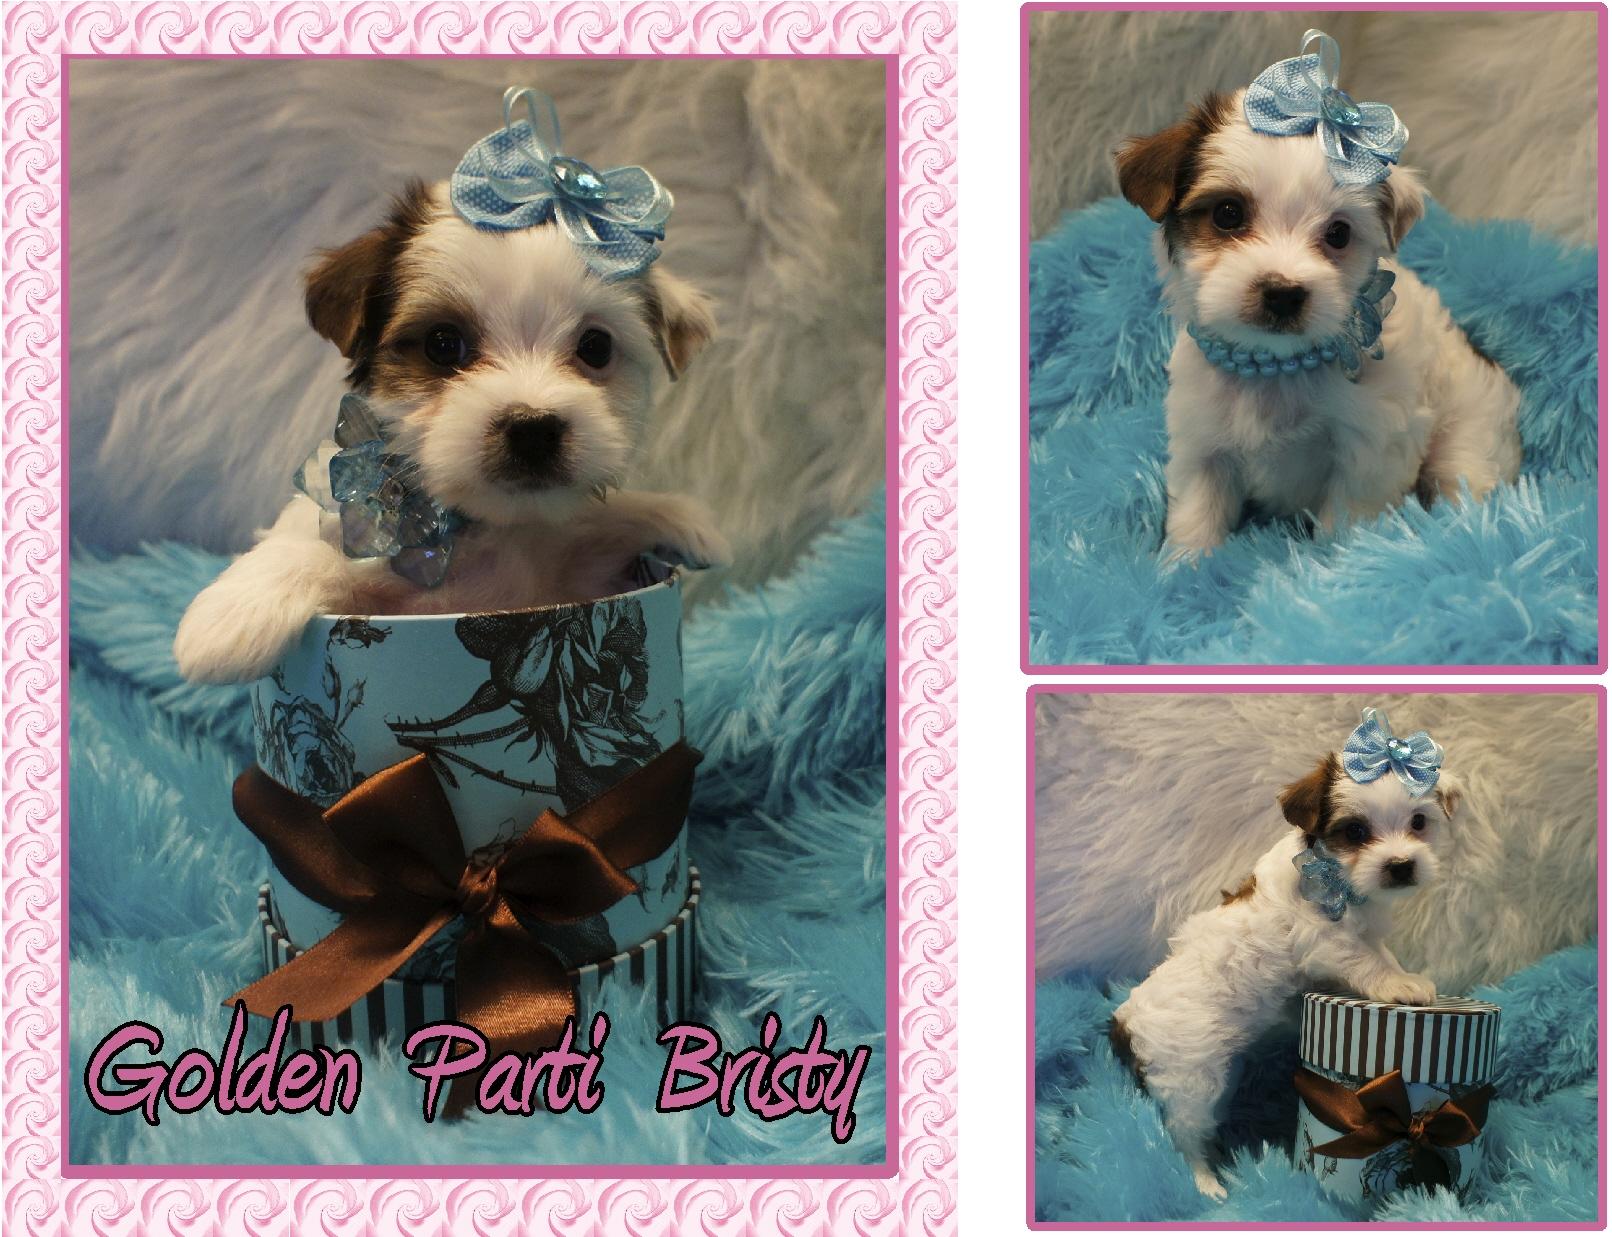 Golden Yorkie puppy for sale